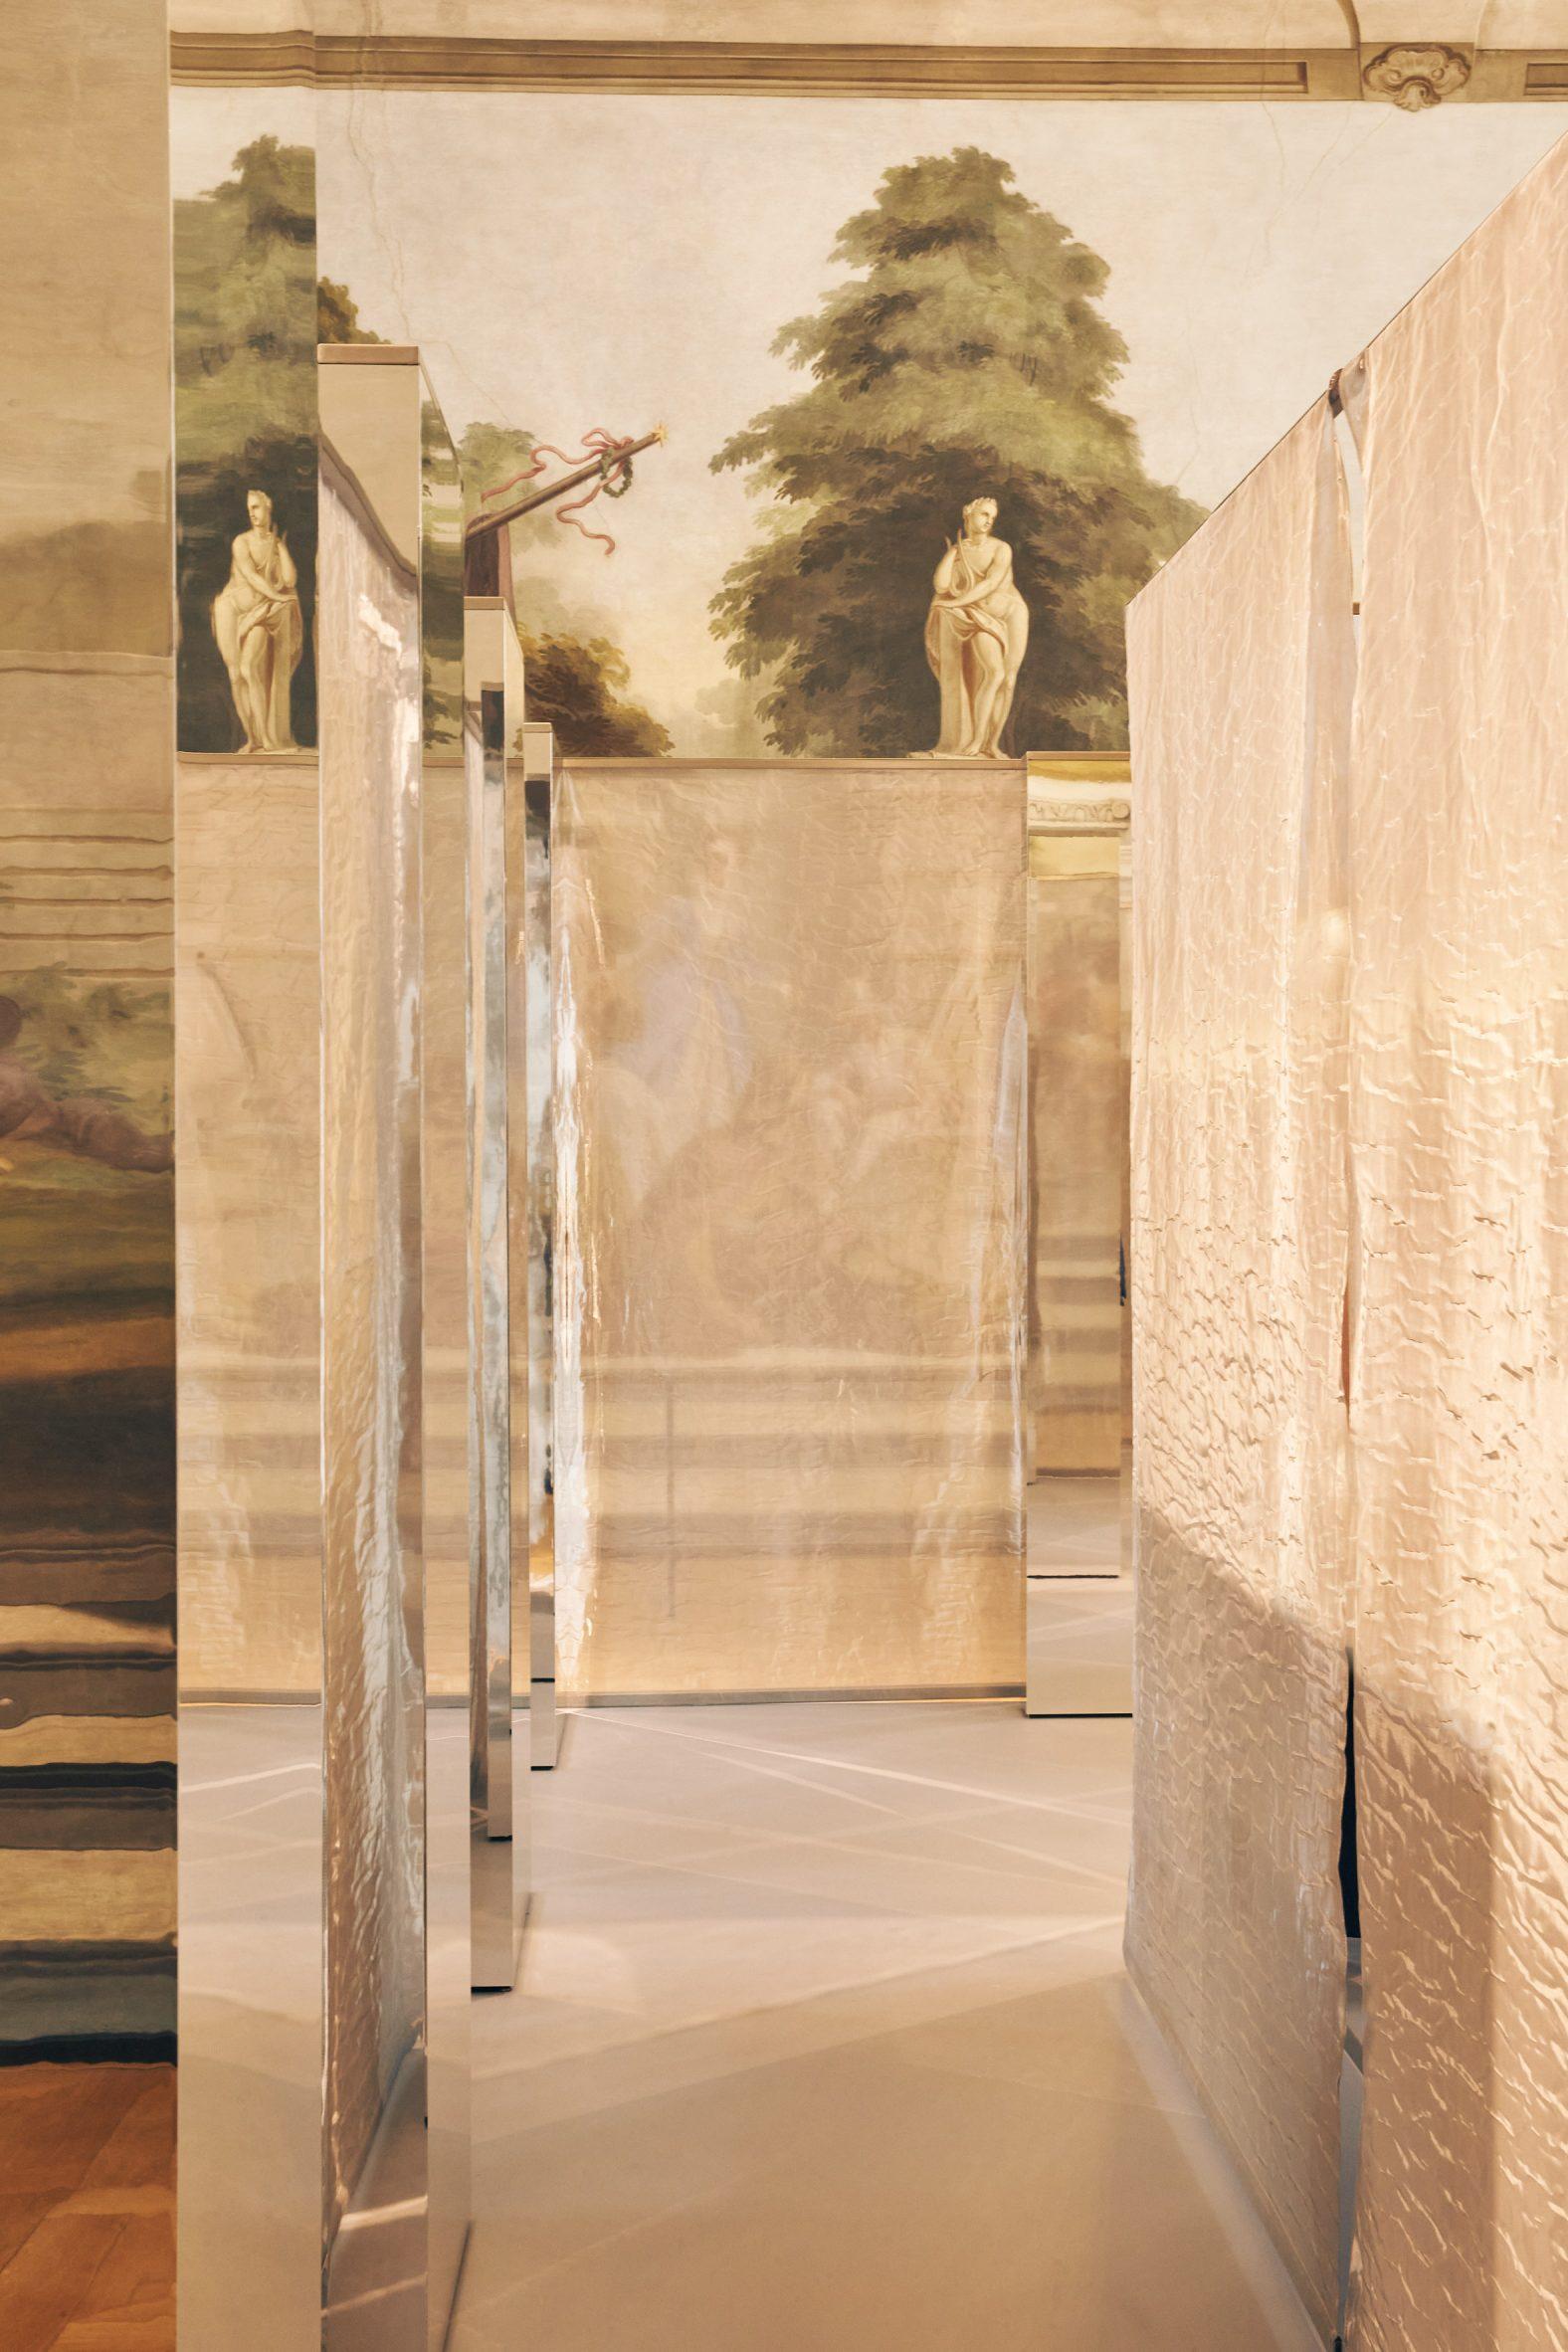 Mirror and mesh installation in COS Bolzano store